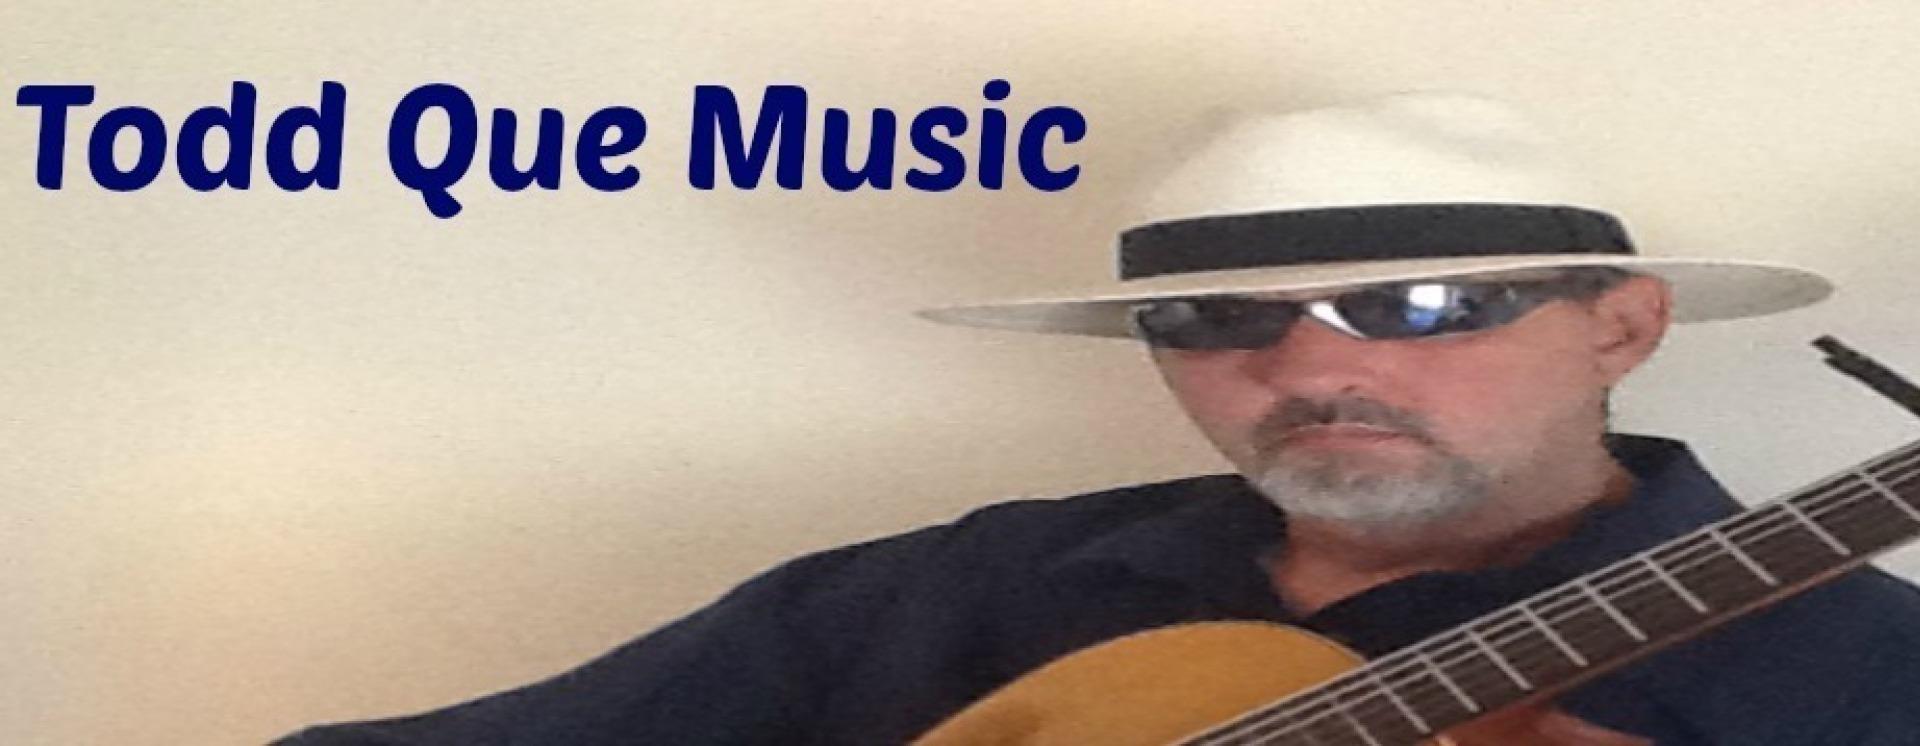 Todd que music banner copy